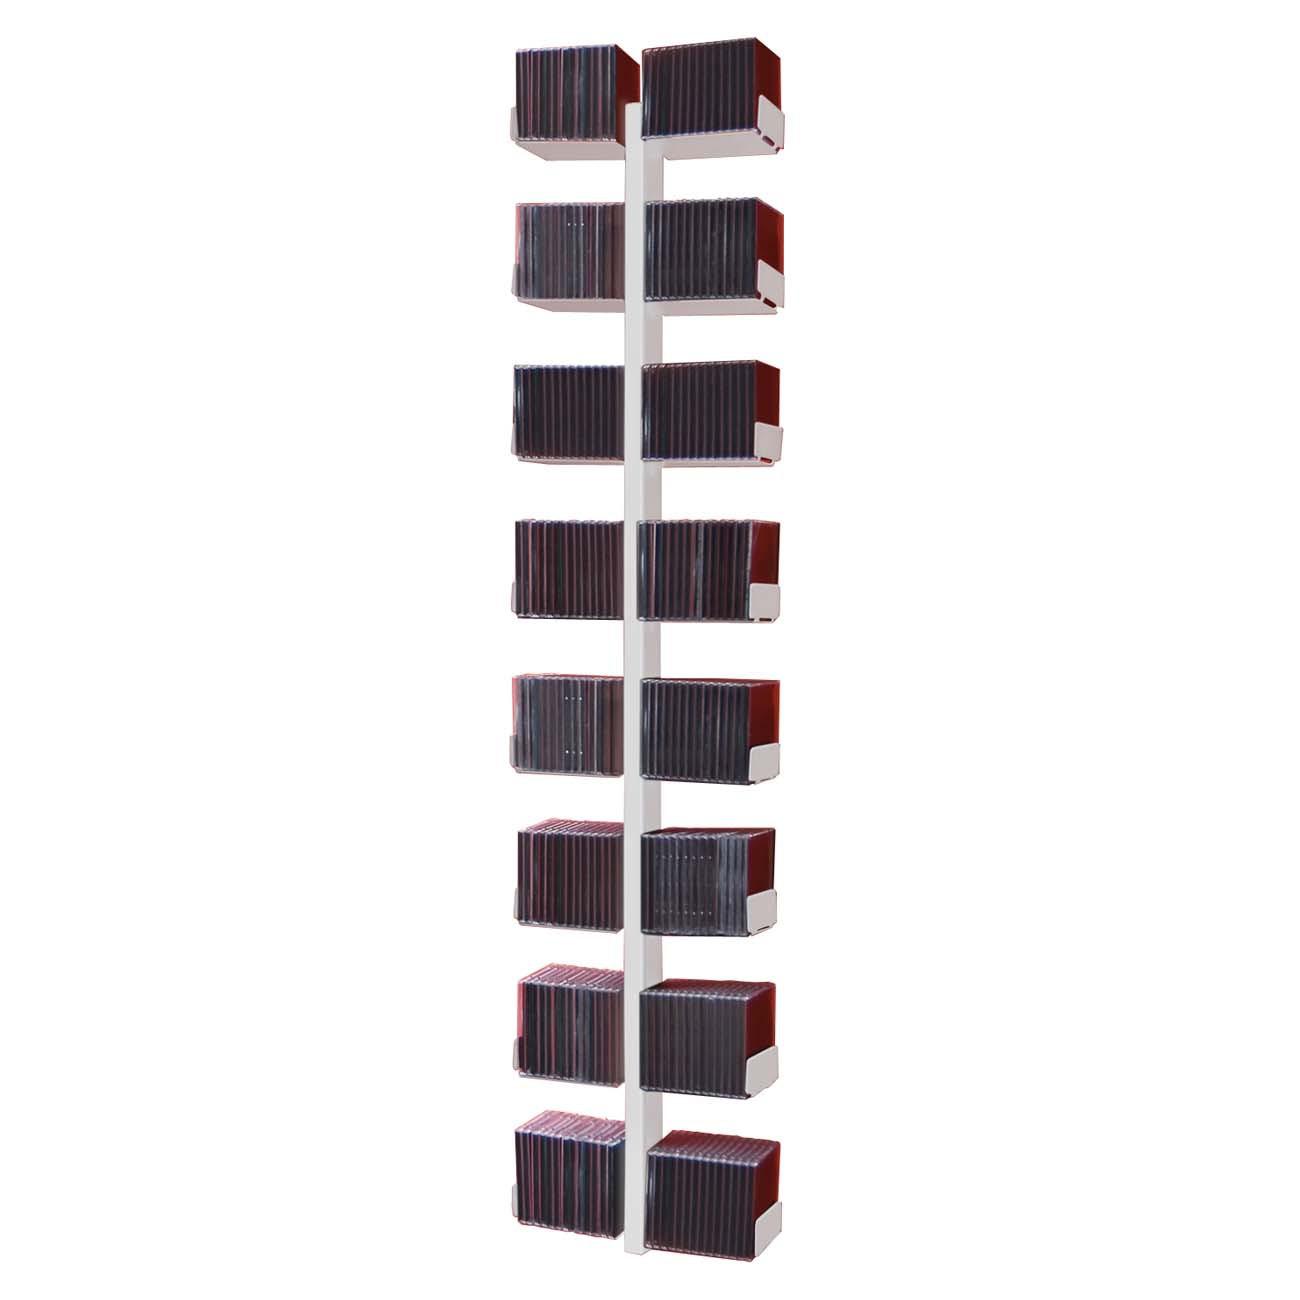 radius cd baum regal weiss wand 1 gro 723 b wandregal cd regal ebay. Black Bedroom Furniture Sets. Home Design Ideas